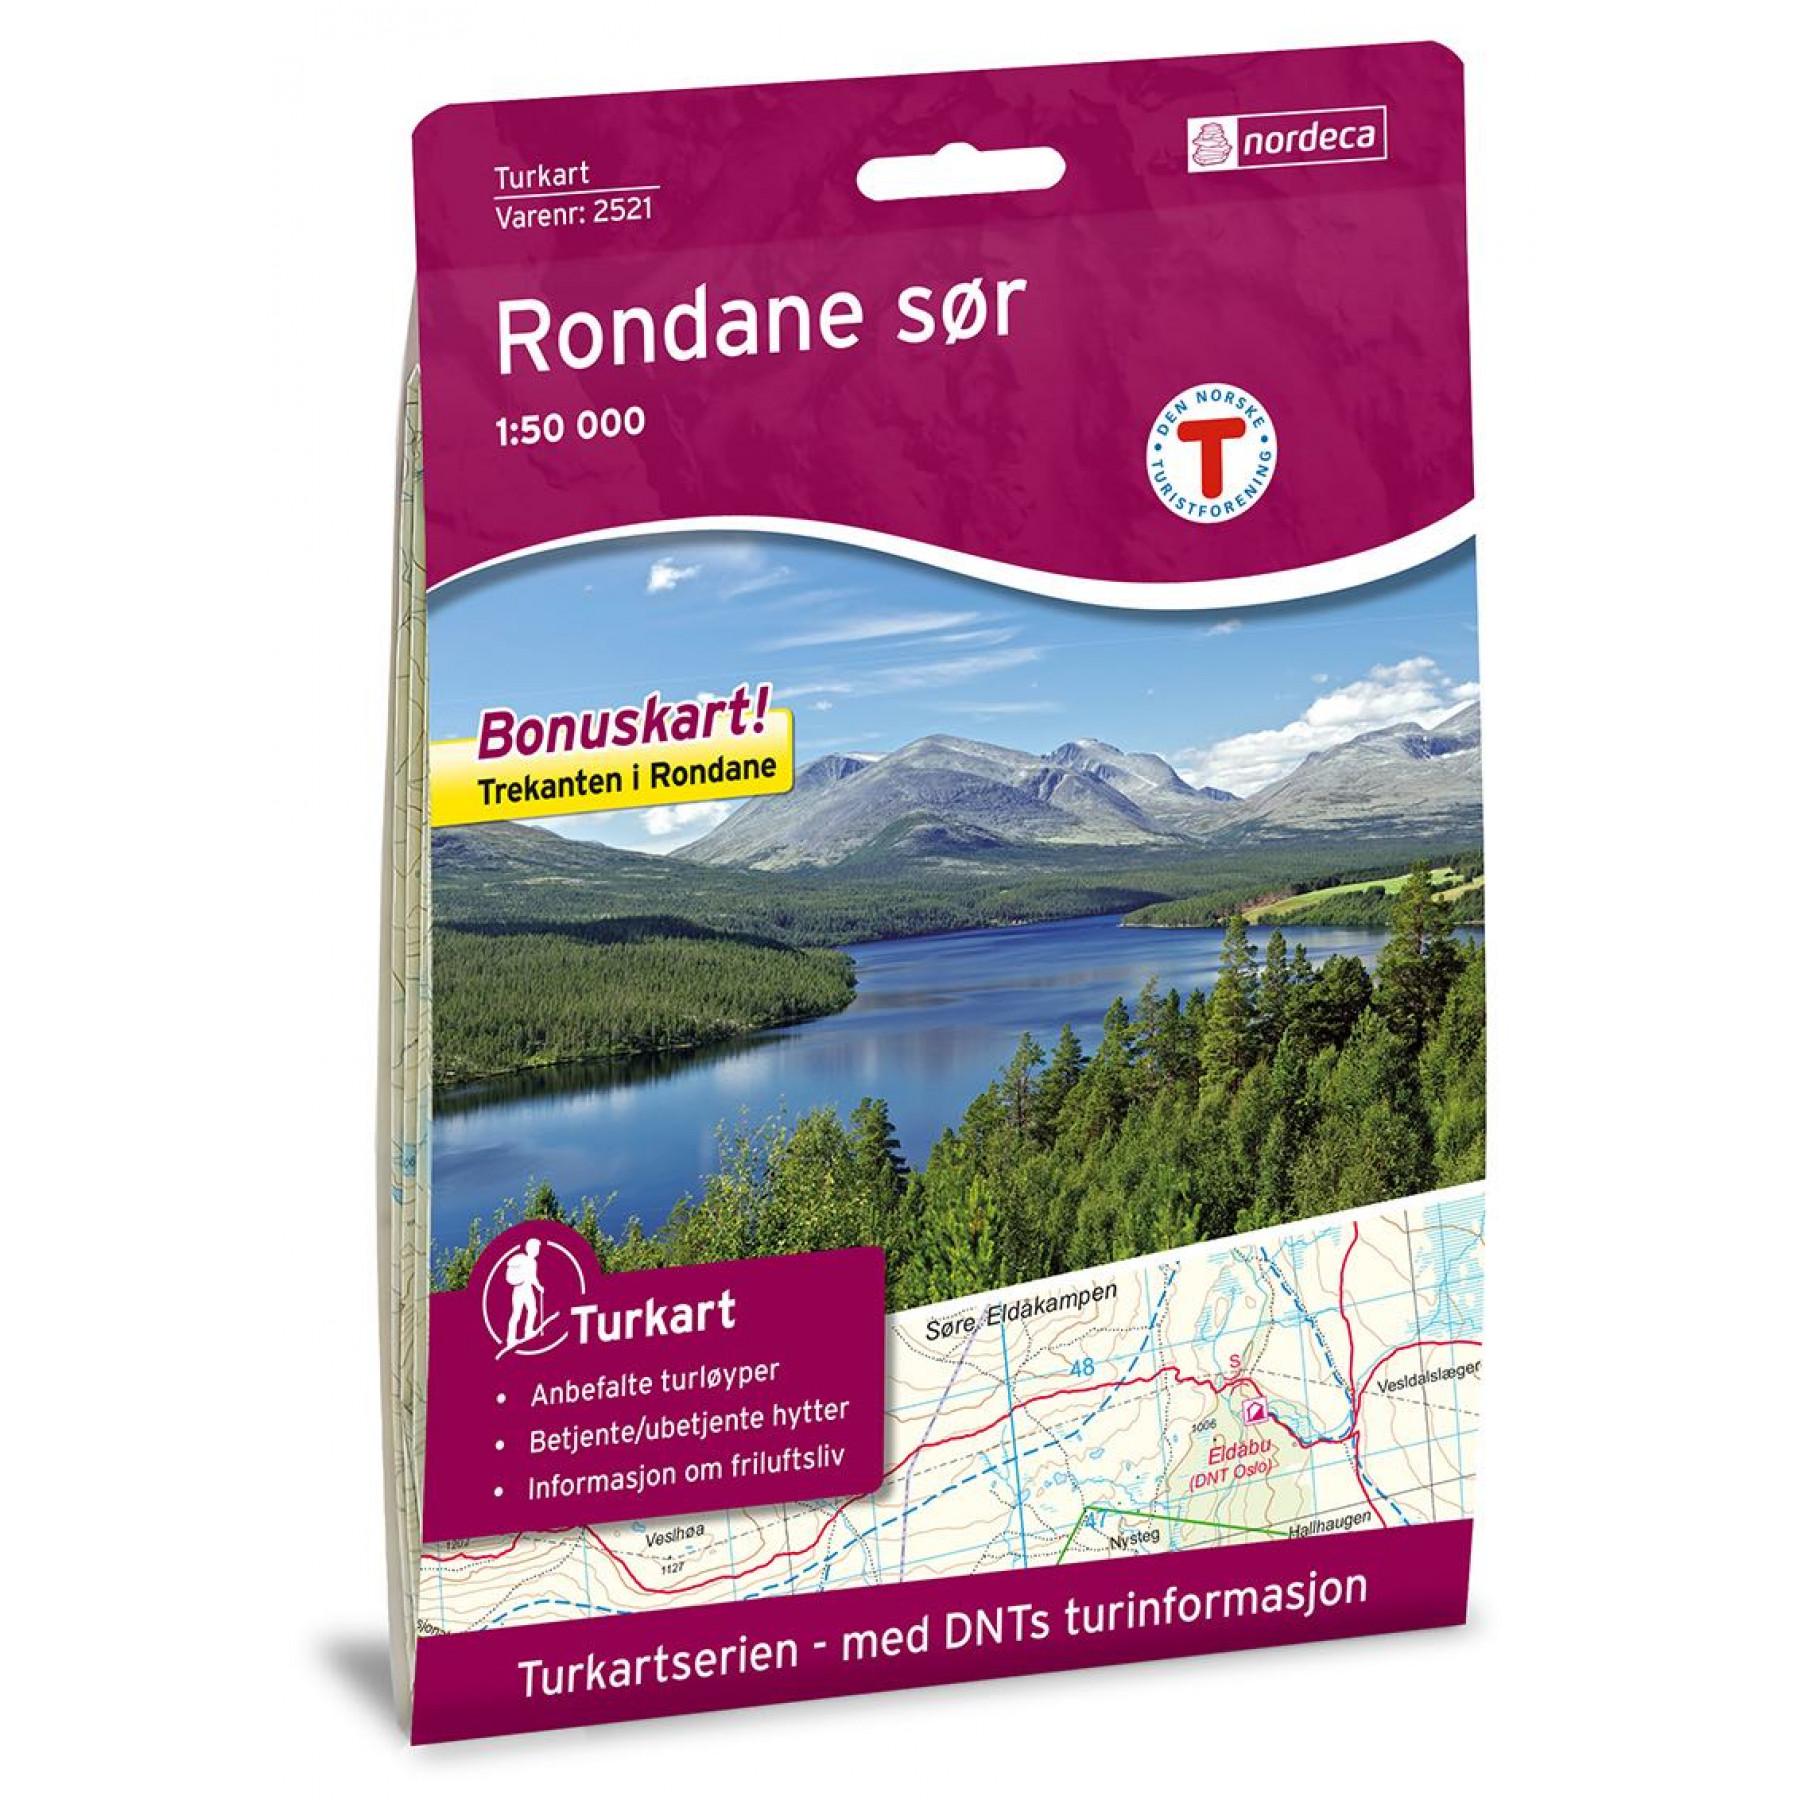 Nordeca Rondane Sor 1 50 000 Turkart Fjellsport No